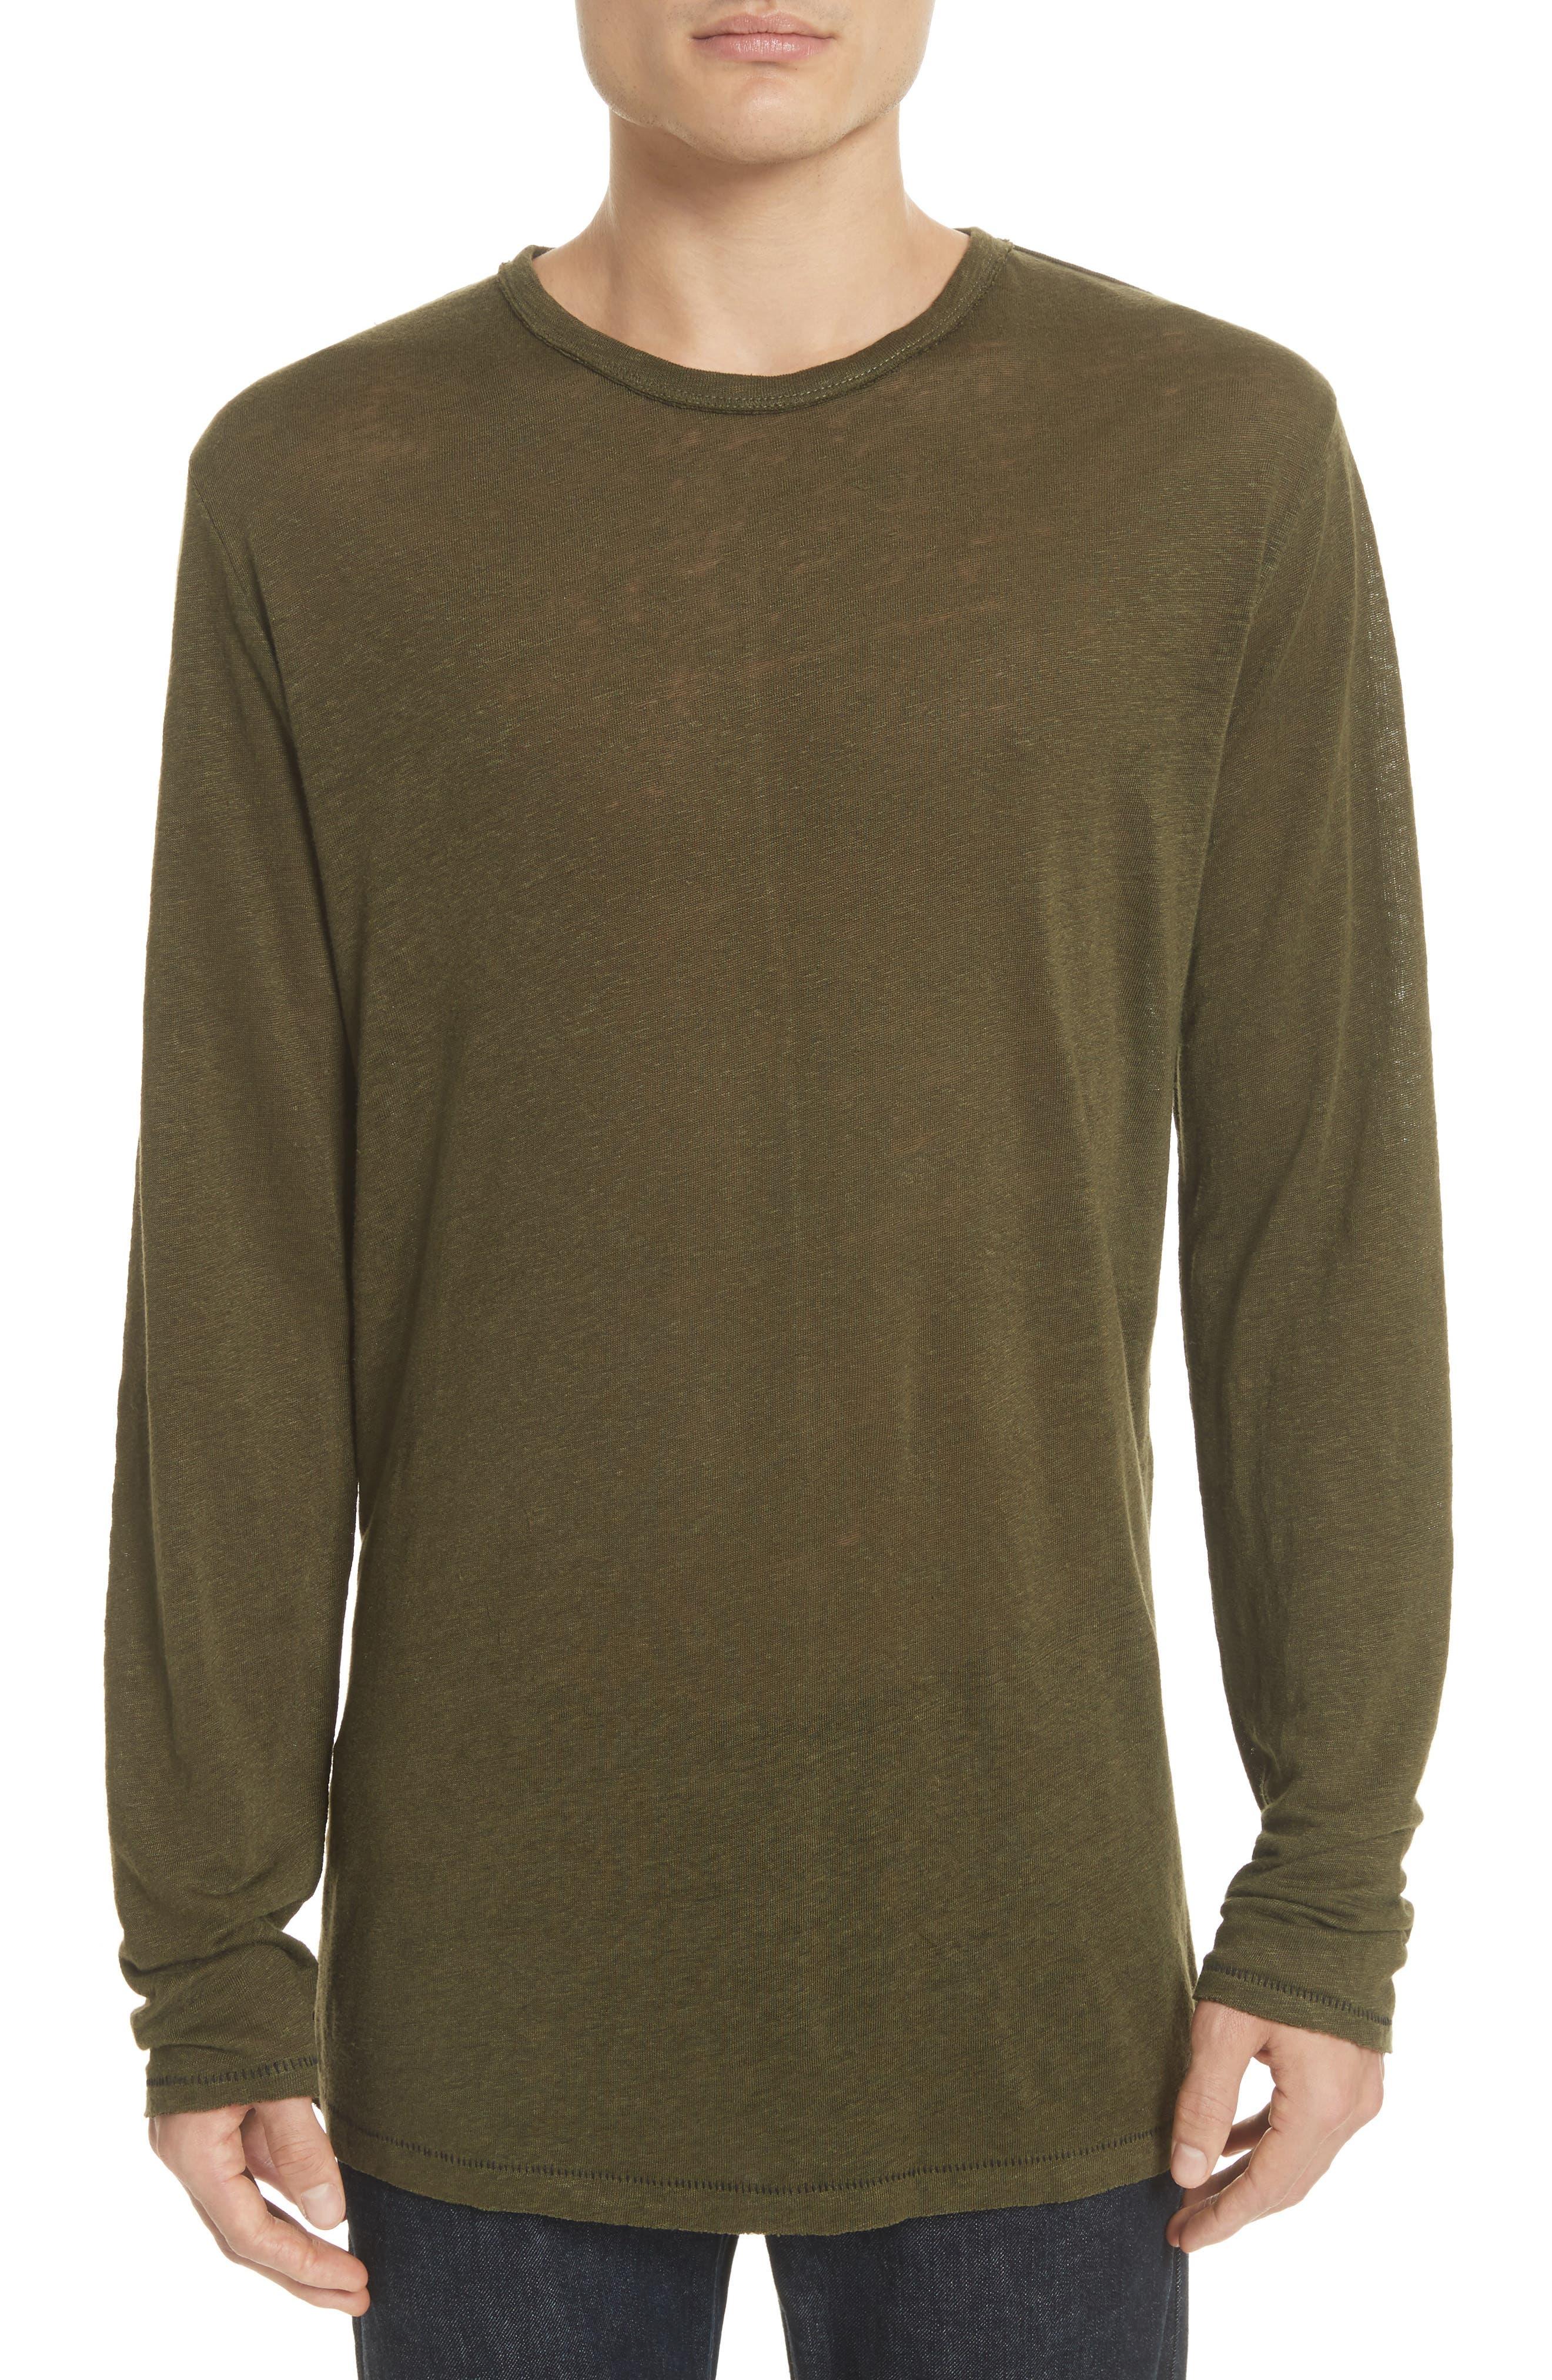 Owen Long Sleeve T-Shirt,                             Main thumbnail 1, color,                             319